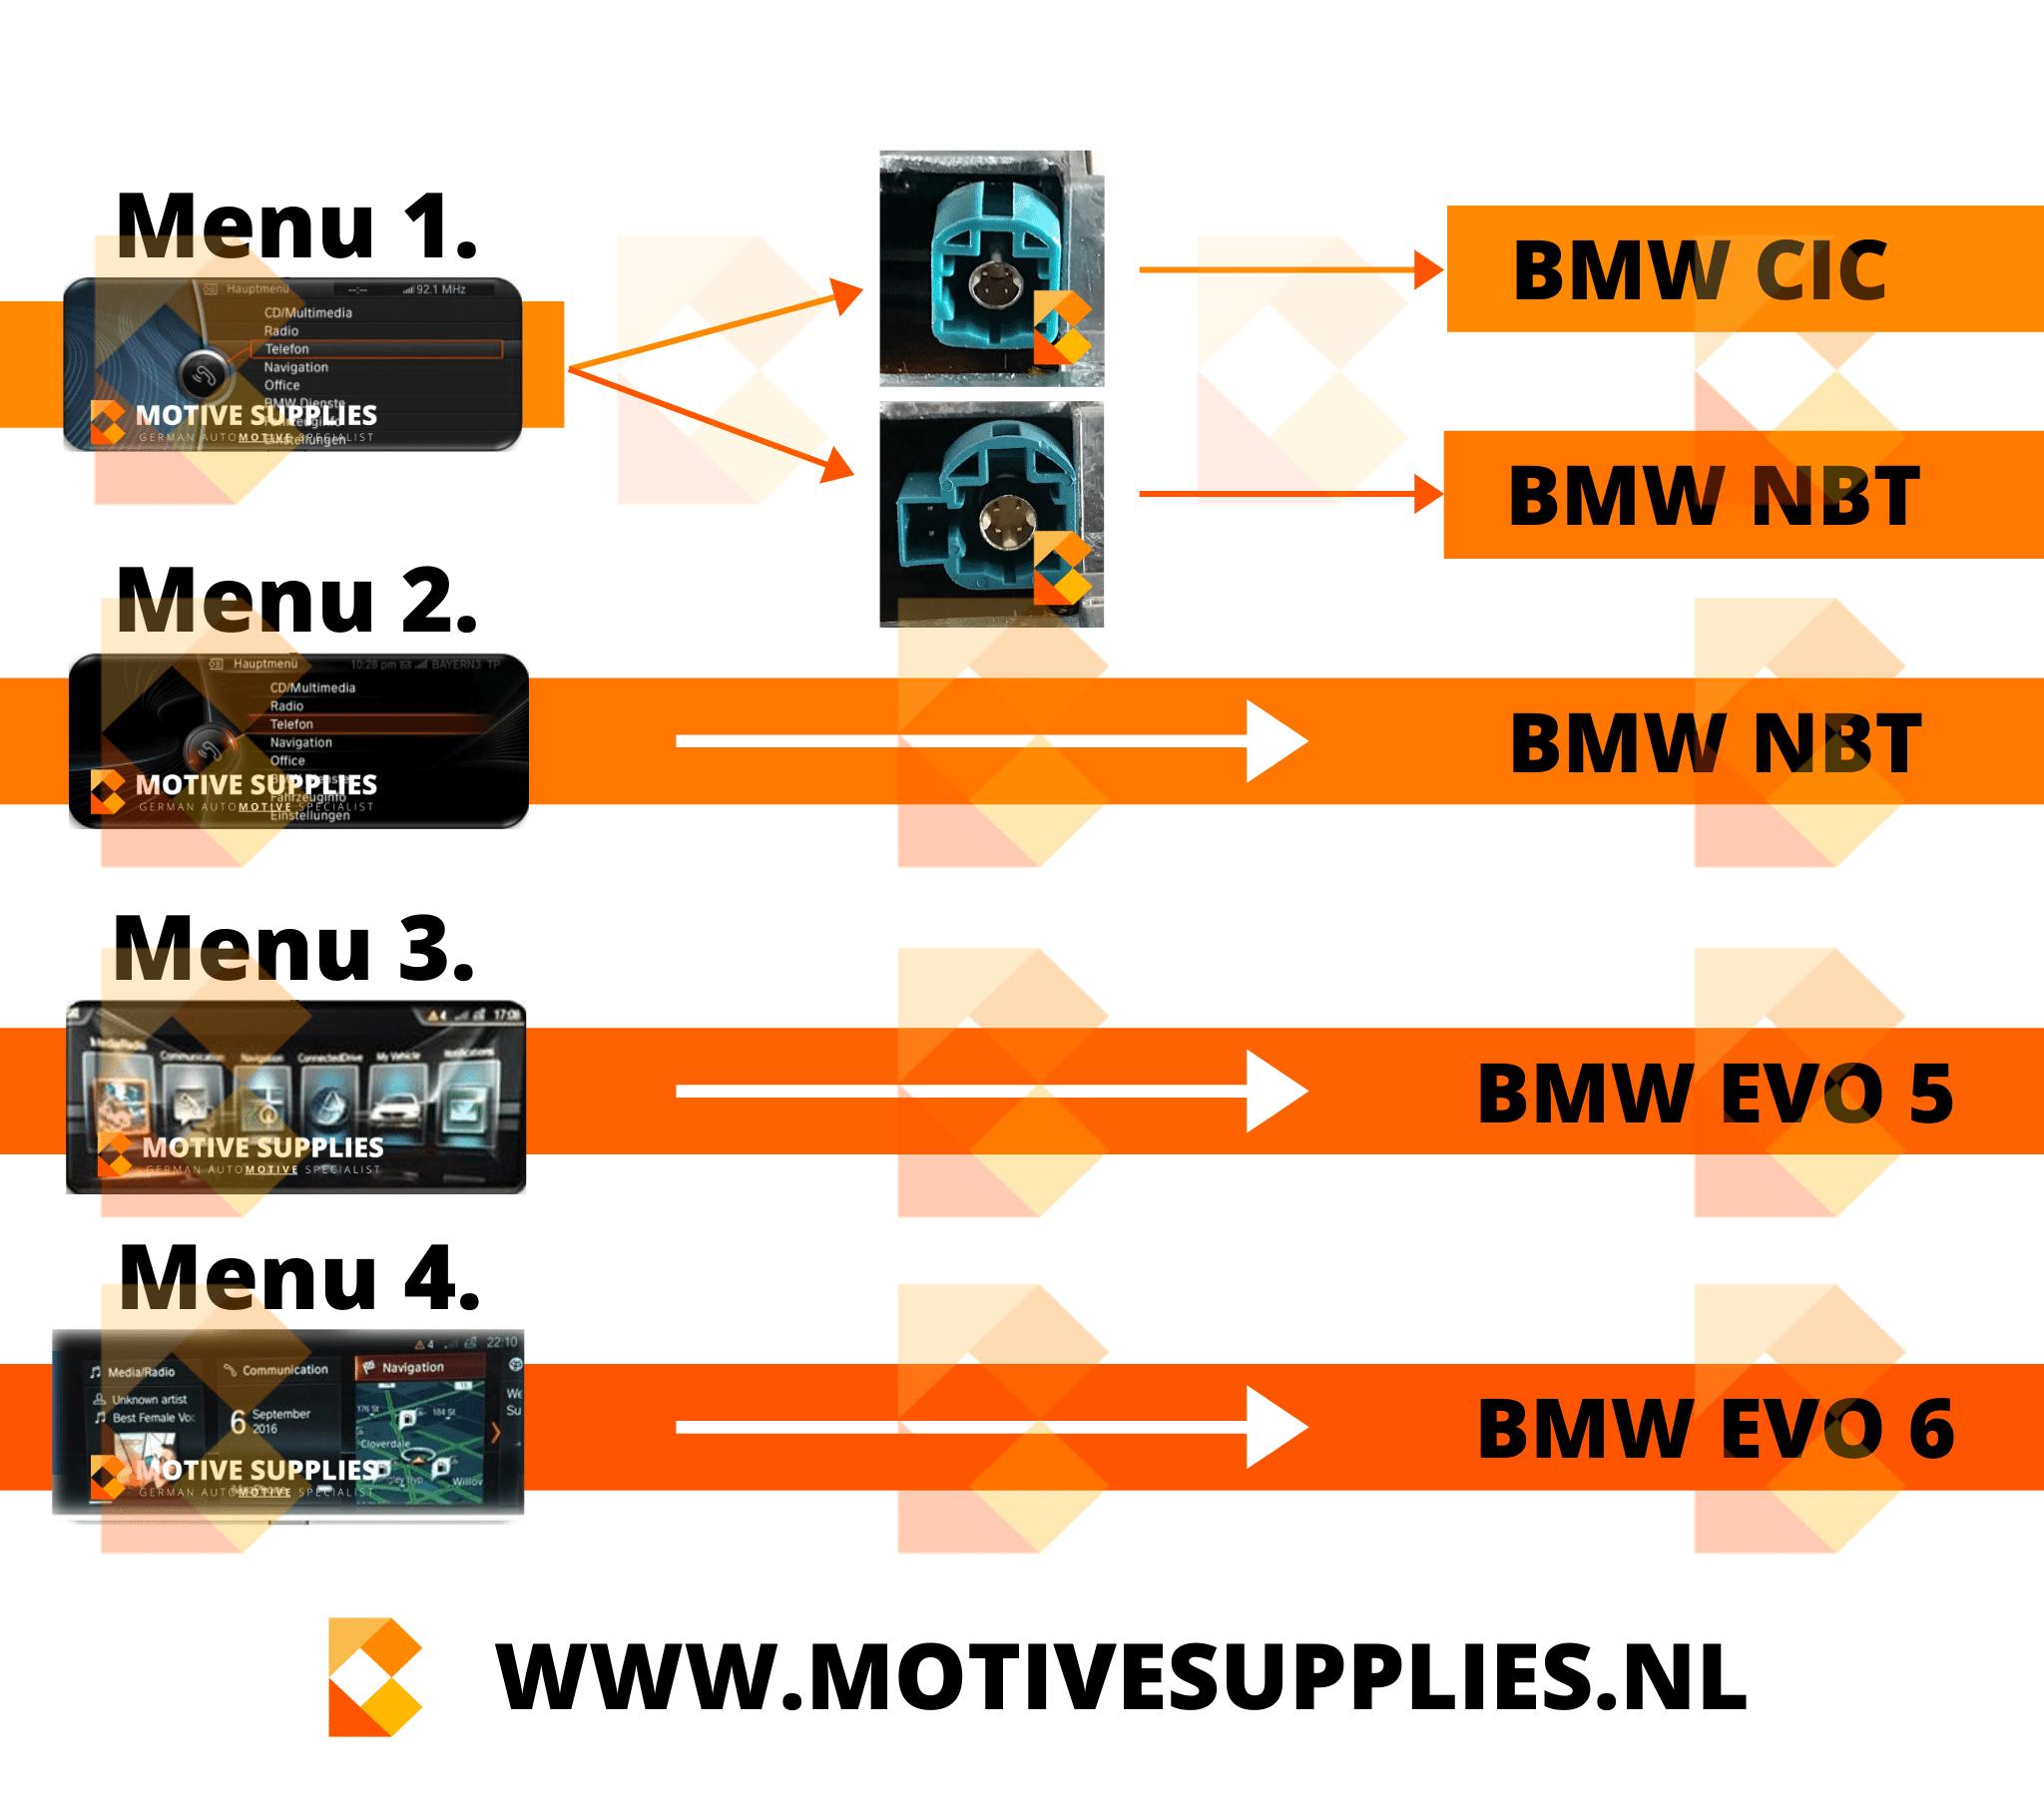 BMW CIC vs NBT vs NBT EVO vs NBT EVO 5 vs NBT EVO 6 - Motivesupplies comparison